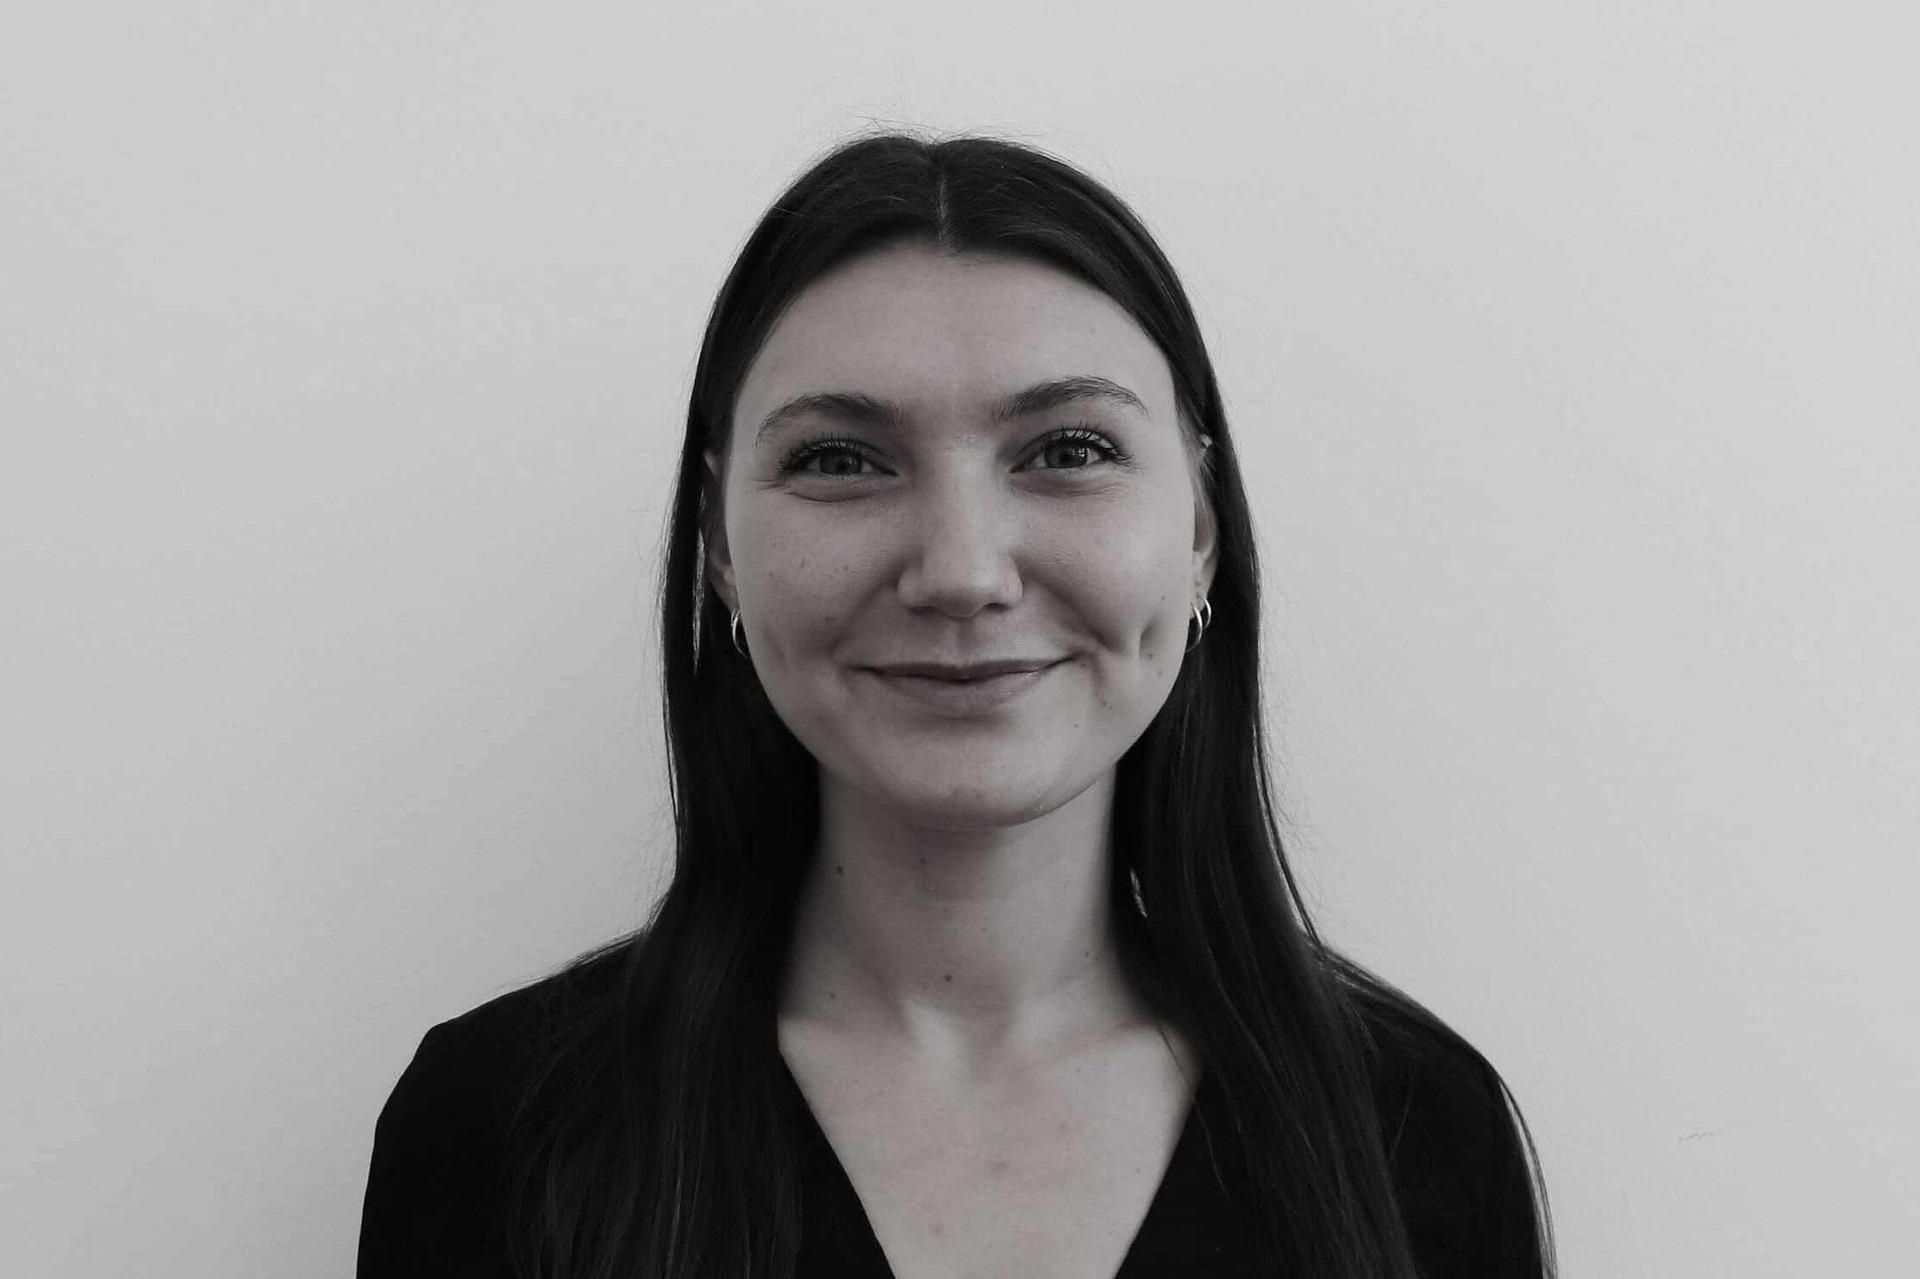 Emilie Lyngaal Jensen